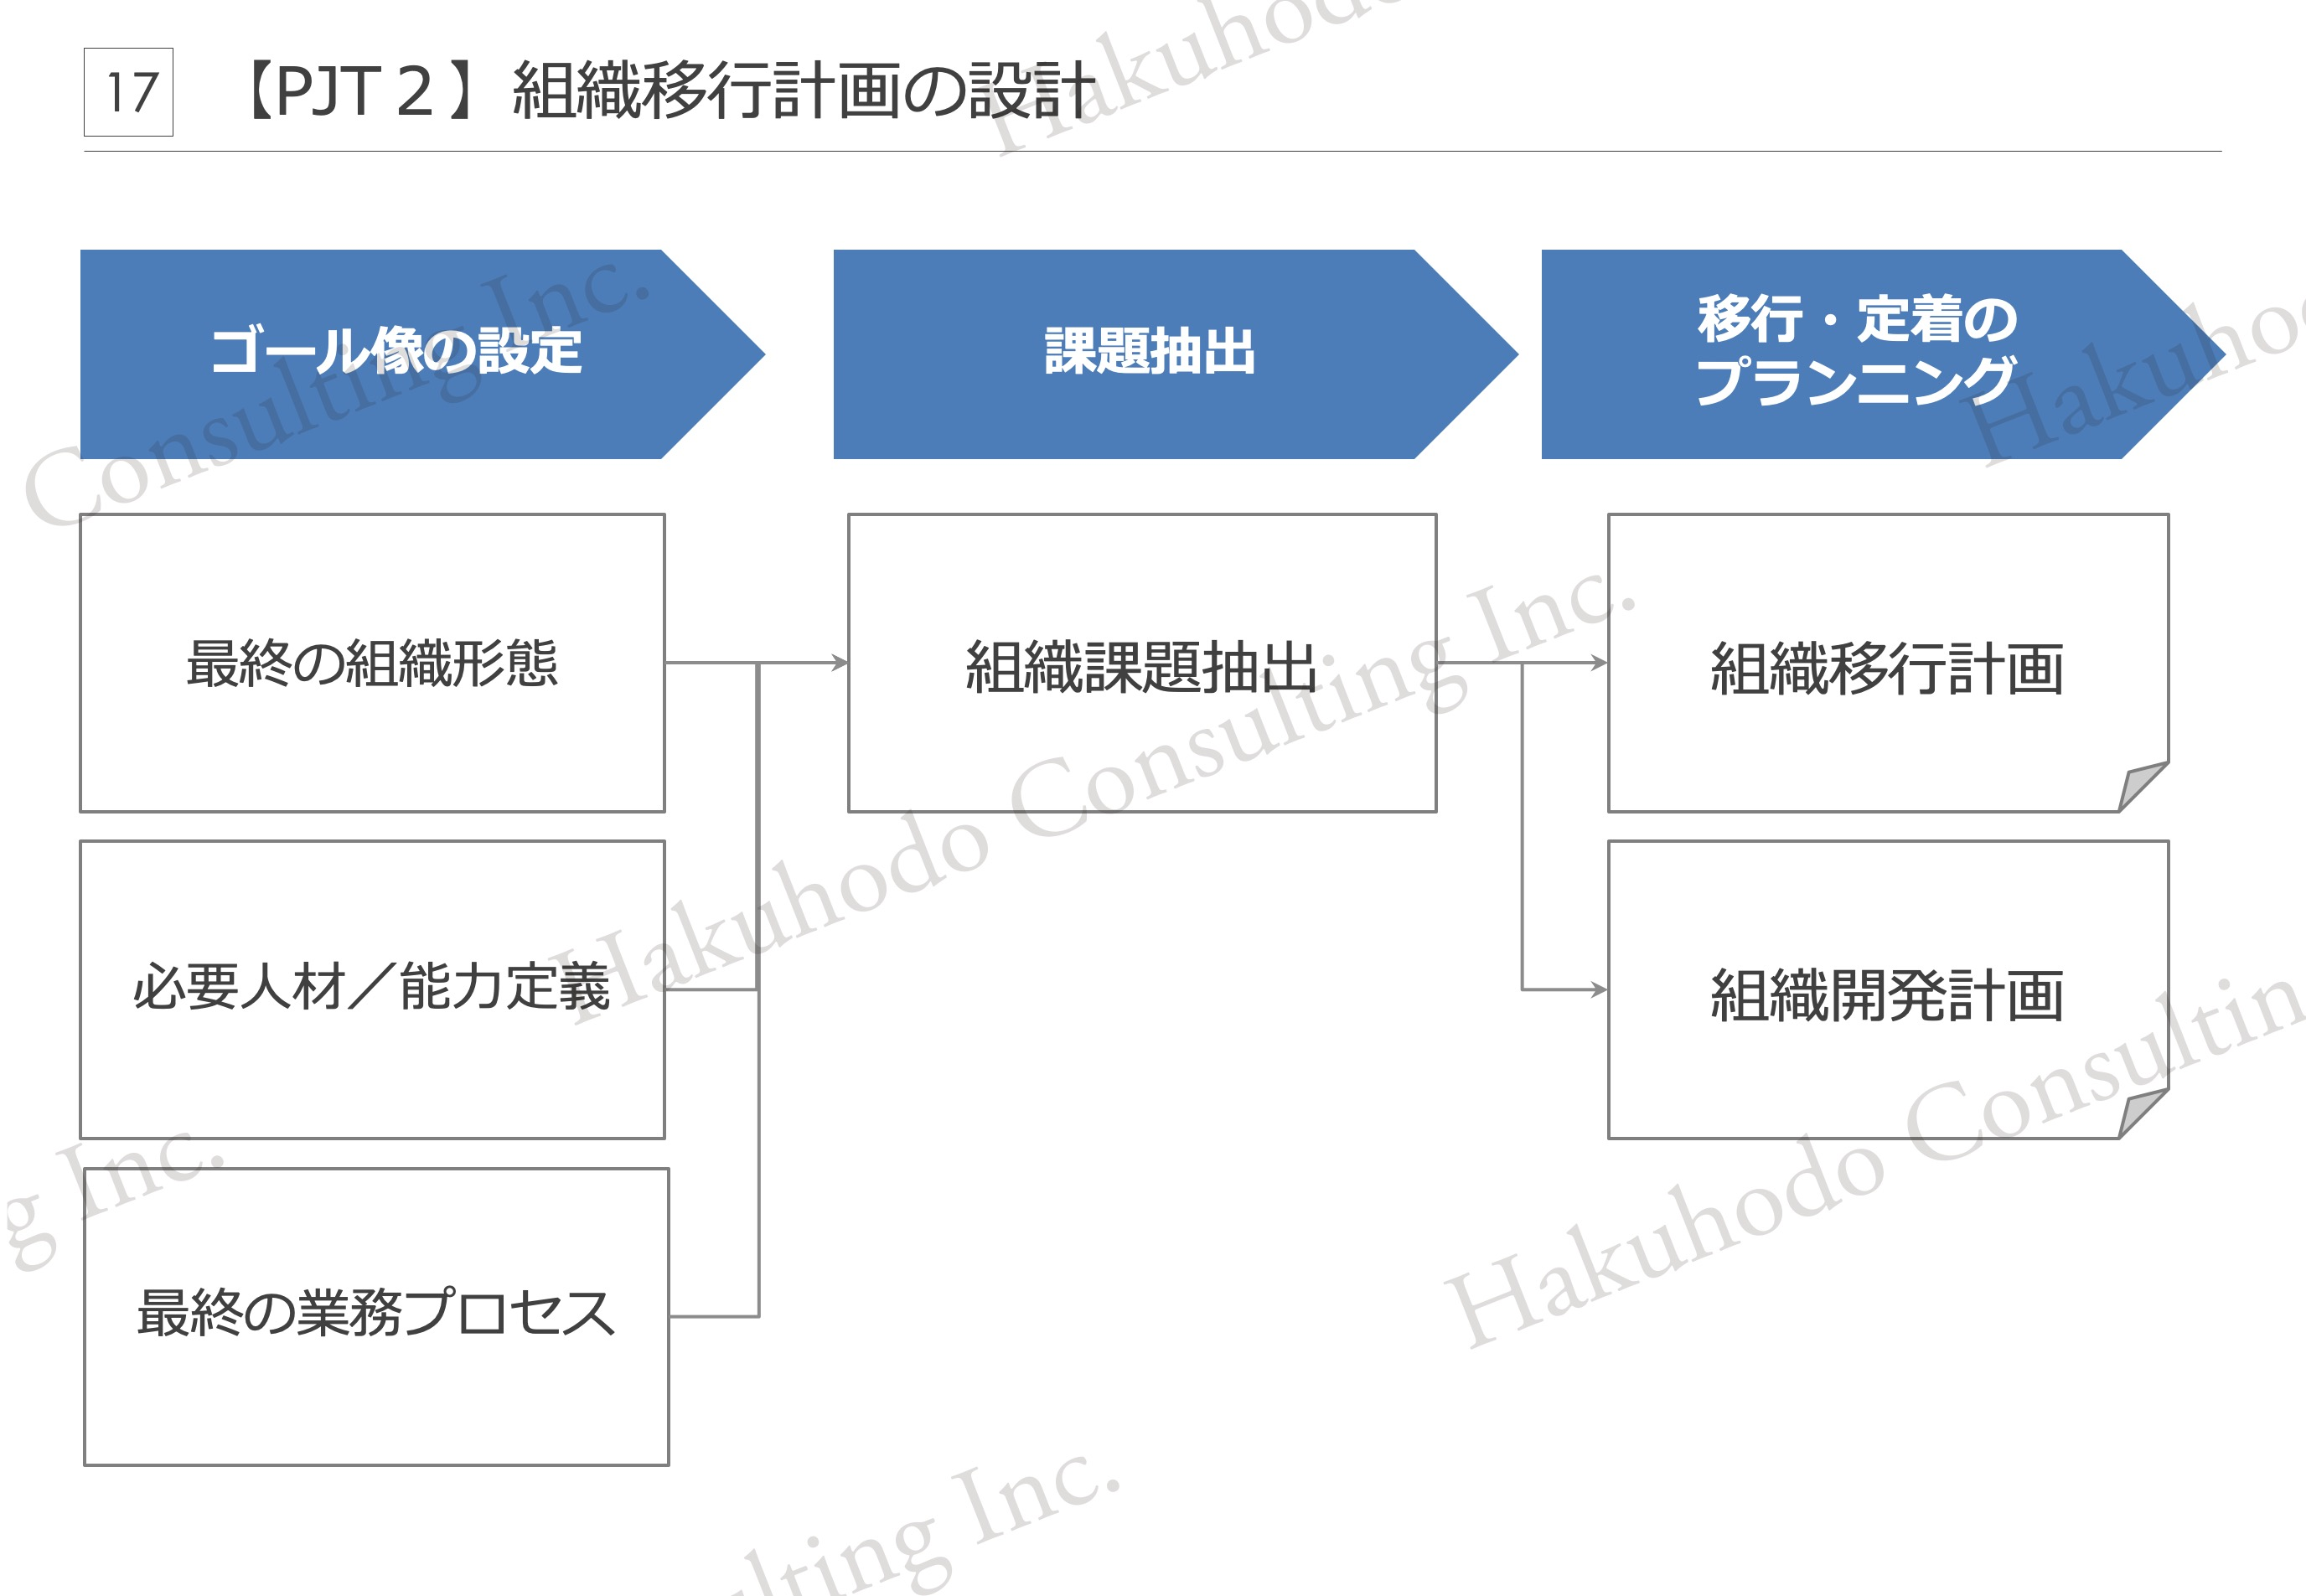 【PJT2】組織移行計画の設計